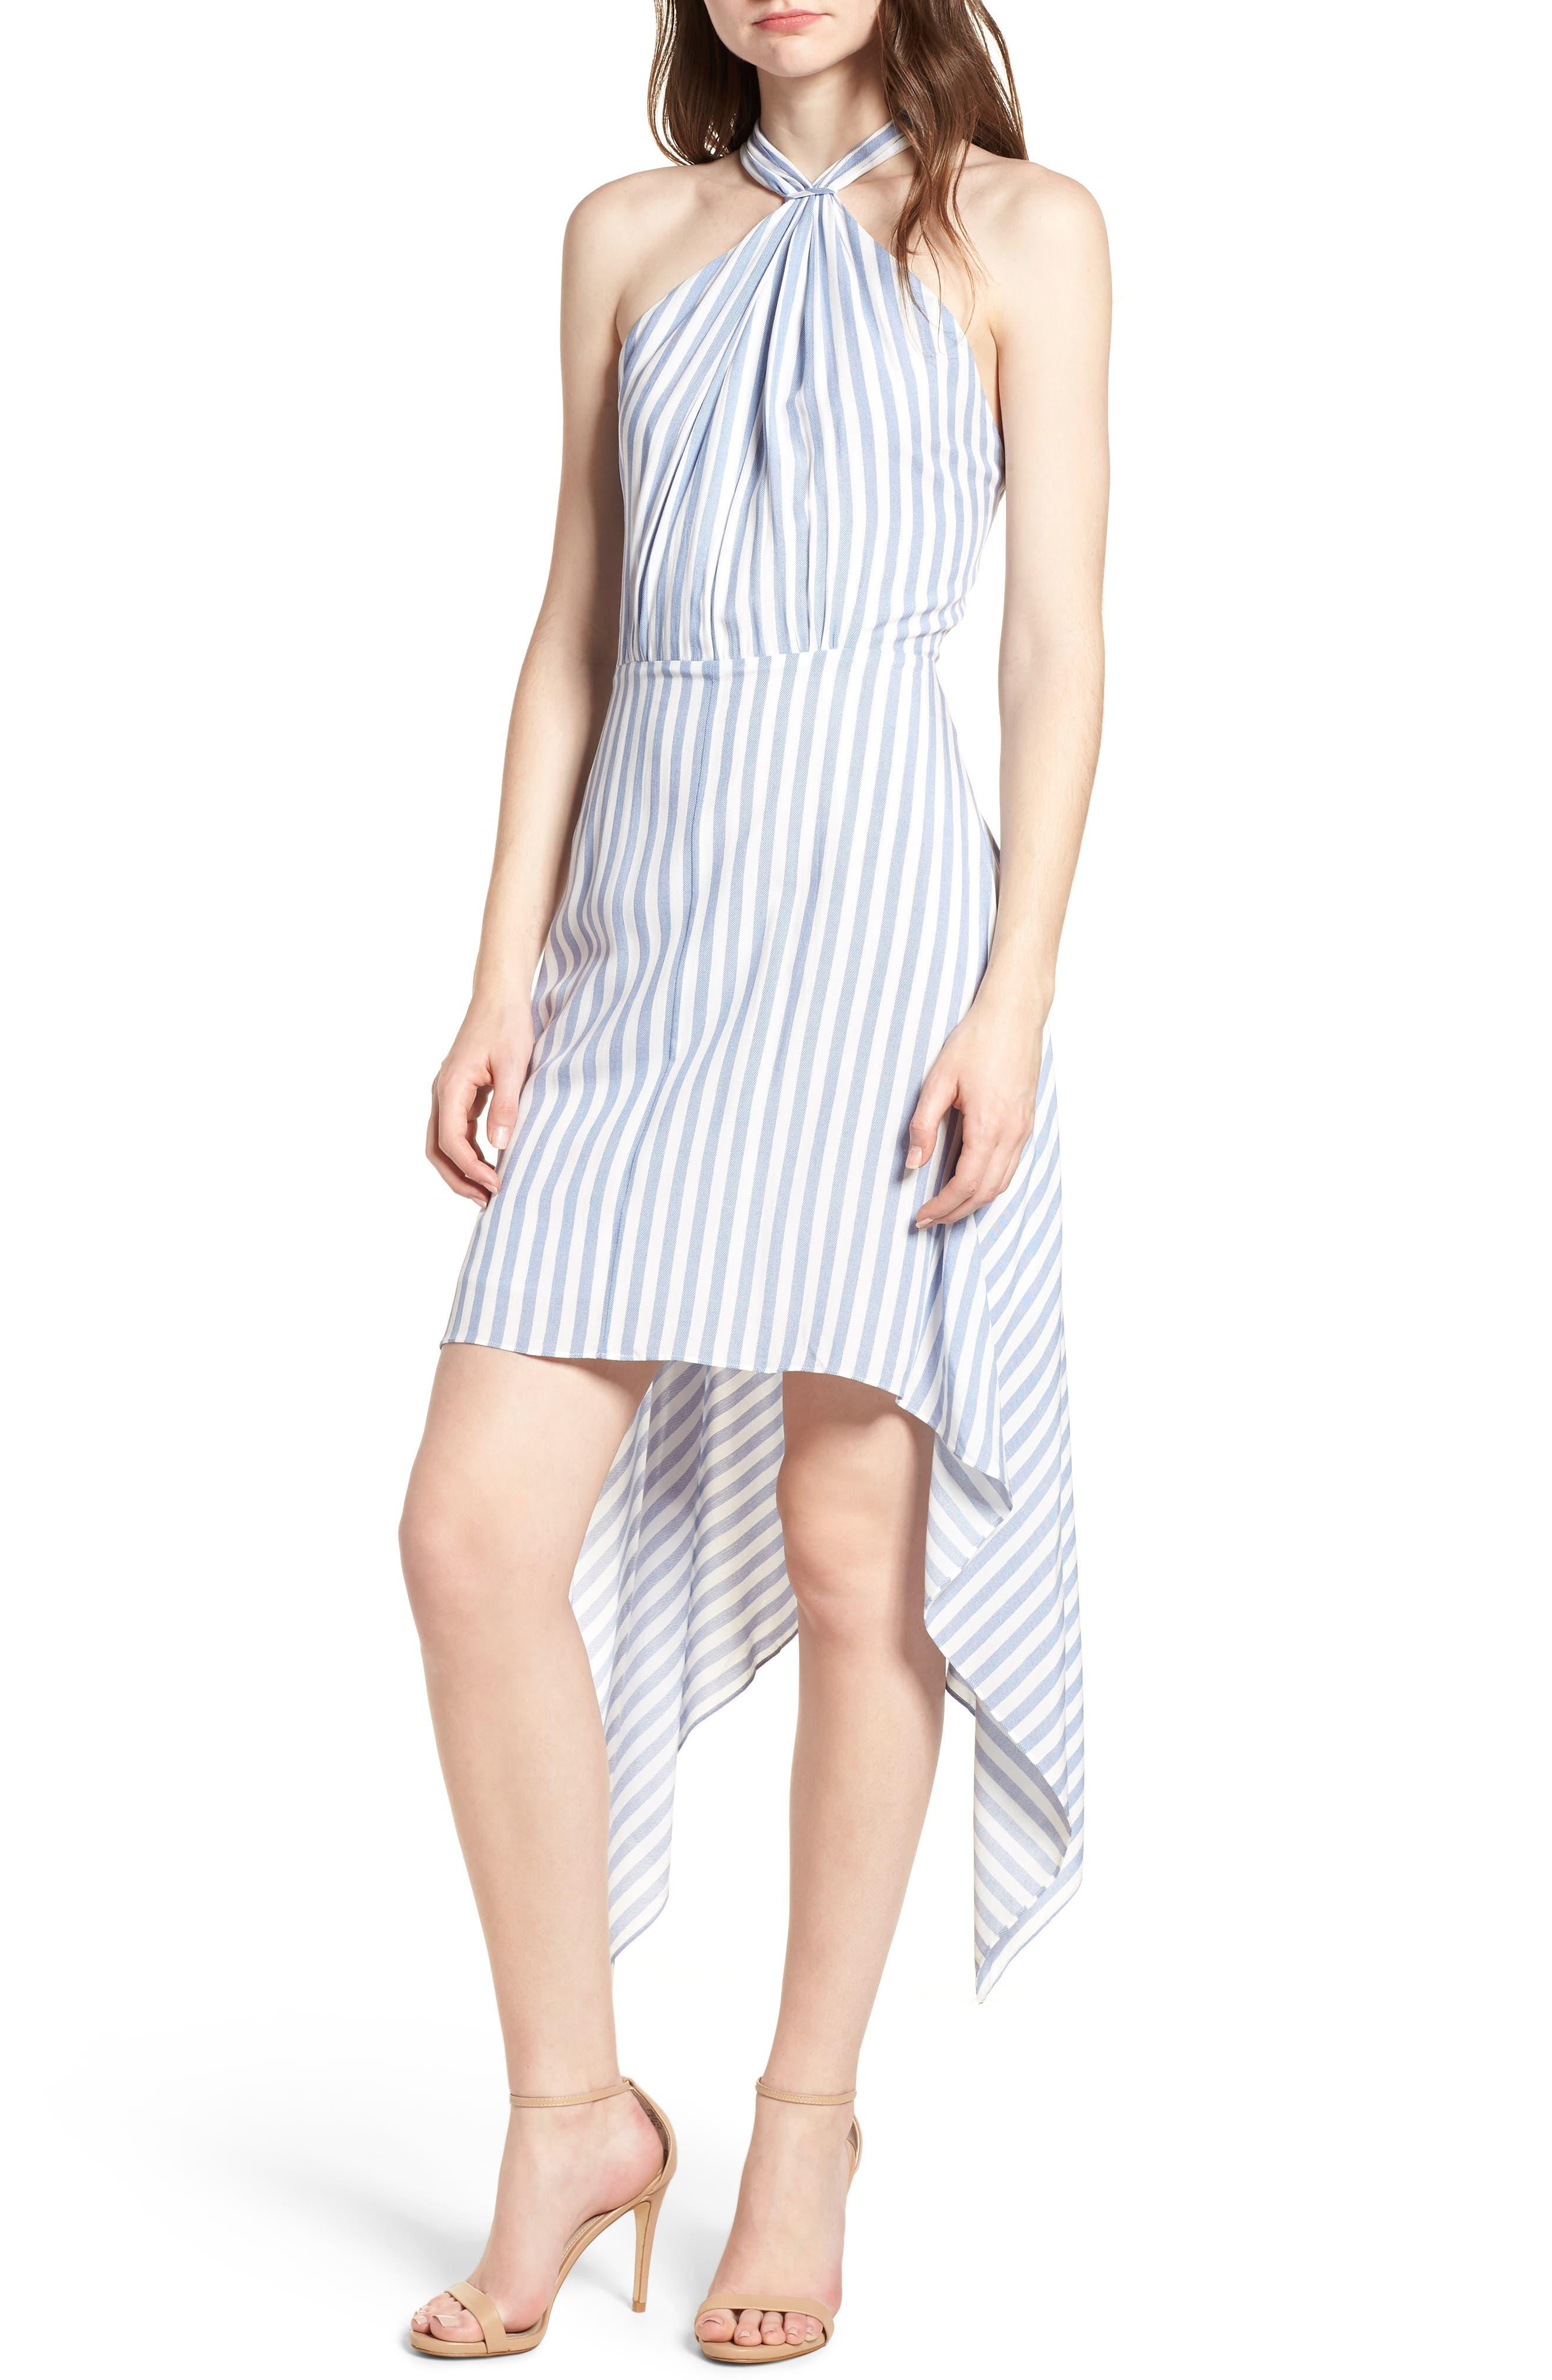 Bishop + Young Ana Stripe Shark Bite Hem Halter Dress,                         Main,                         color, Blue White Stripe